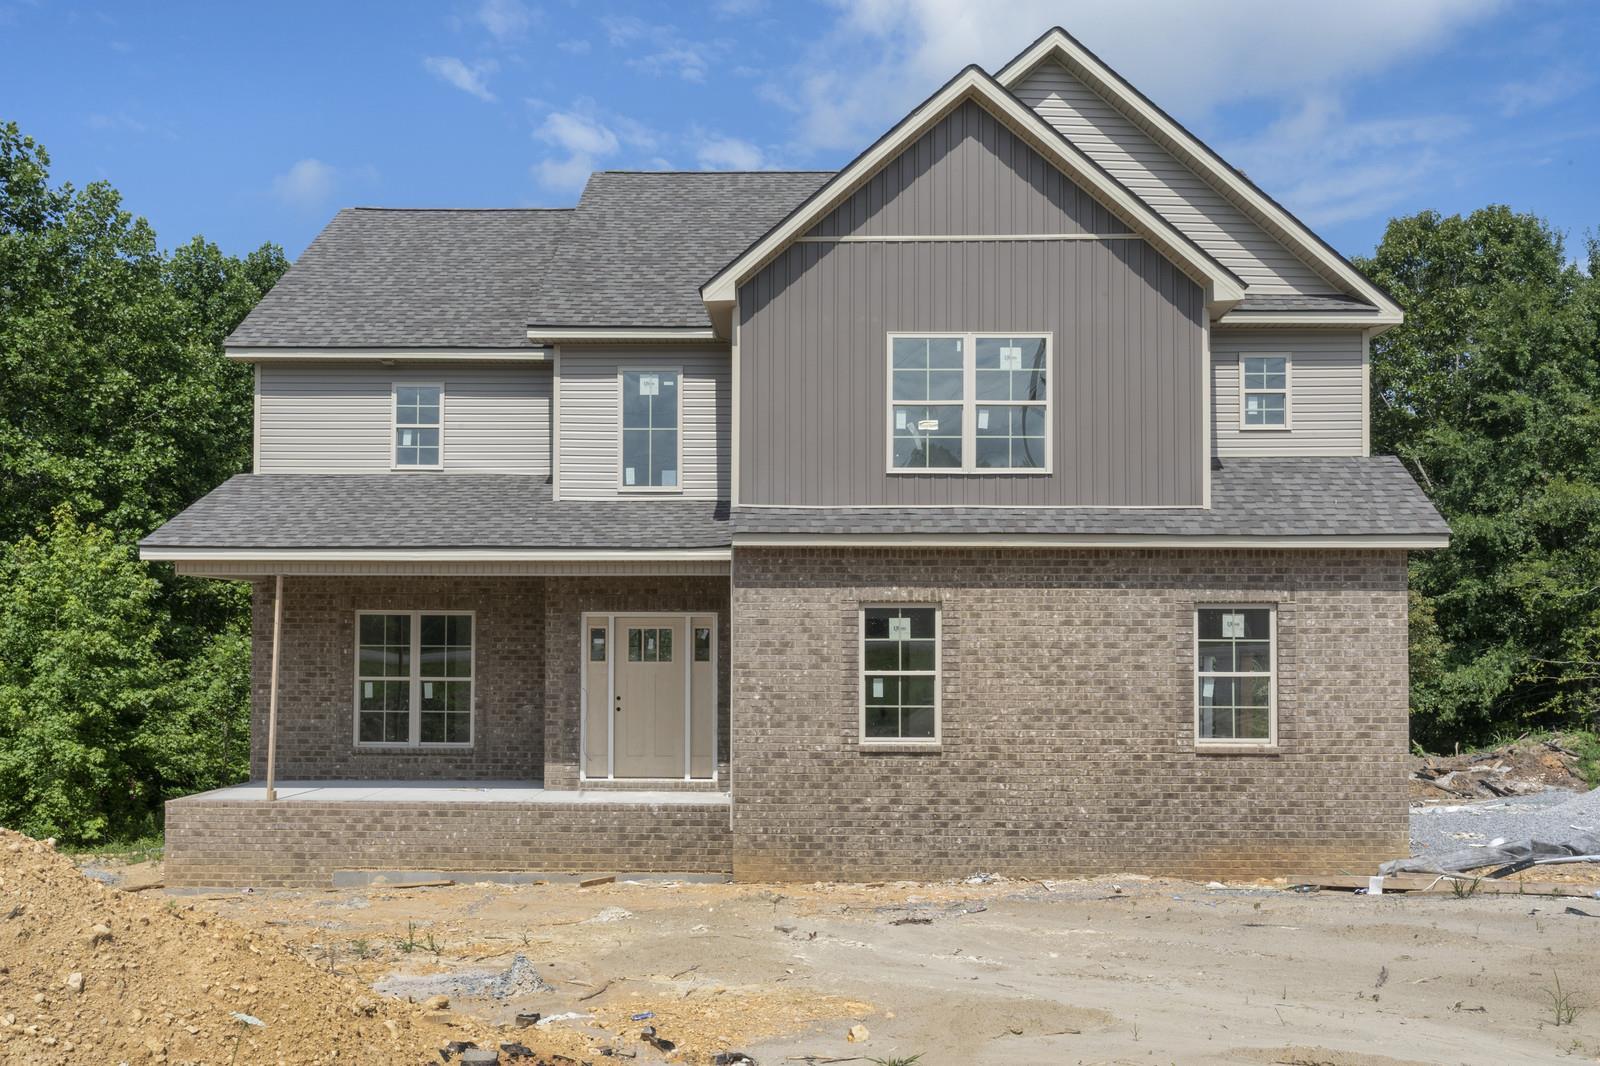 4564 Old Highway 48, Cunningham, TN 37052 - Cunningham, TN real estate listing